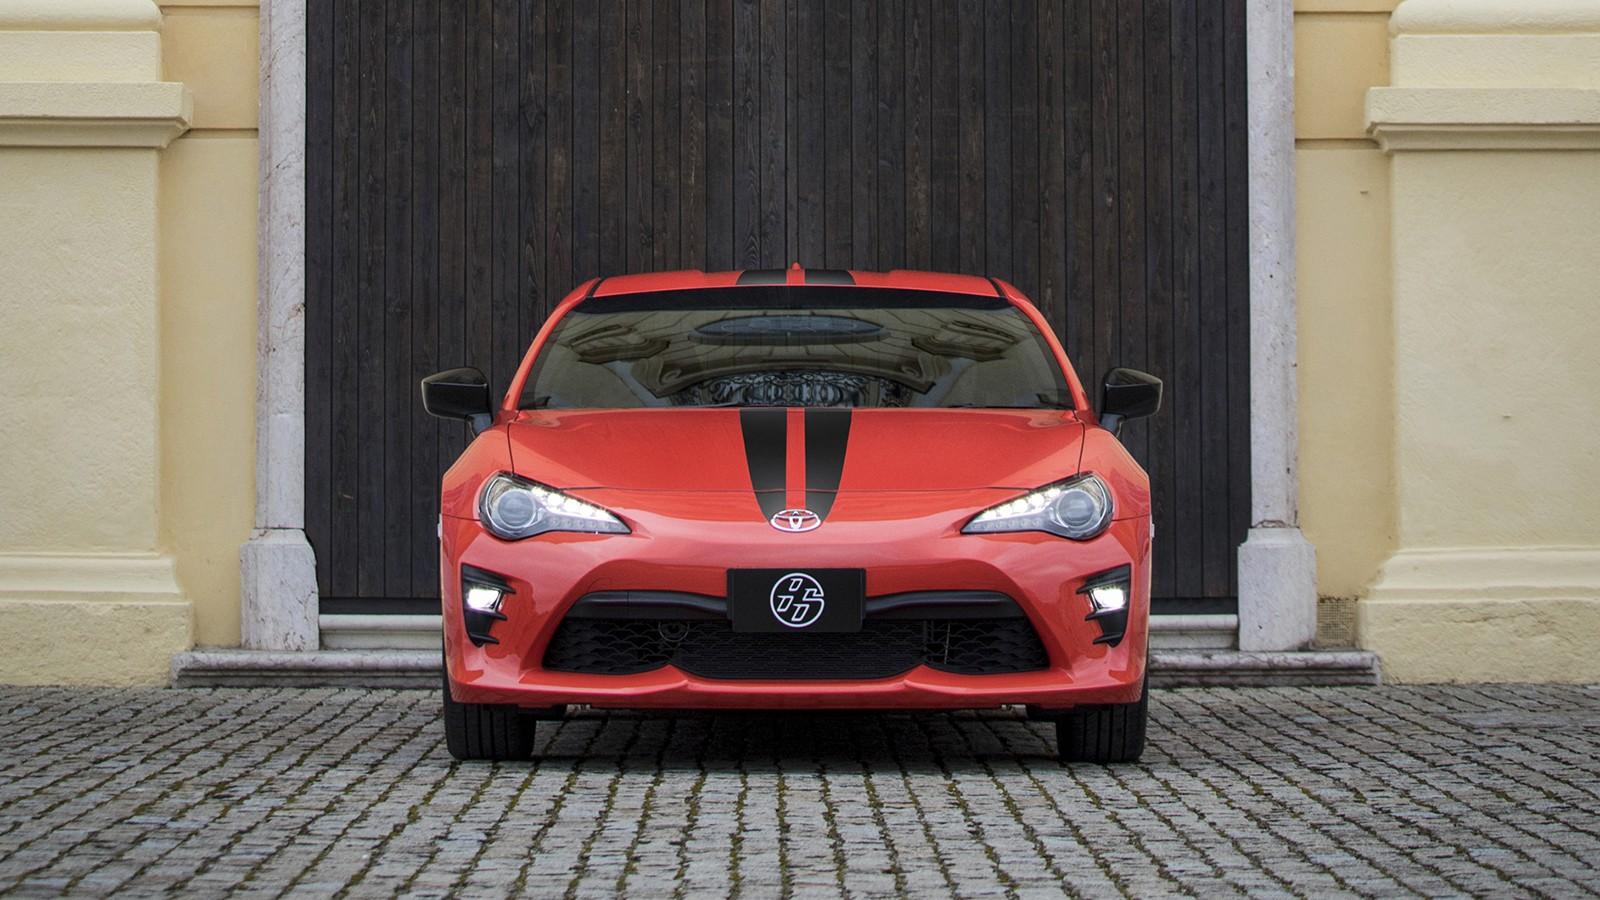 2017_Toyota_86_860_Special_Edition_04_A19195FFF604E48DE2118C6E2C005D4B23EF5D4C